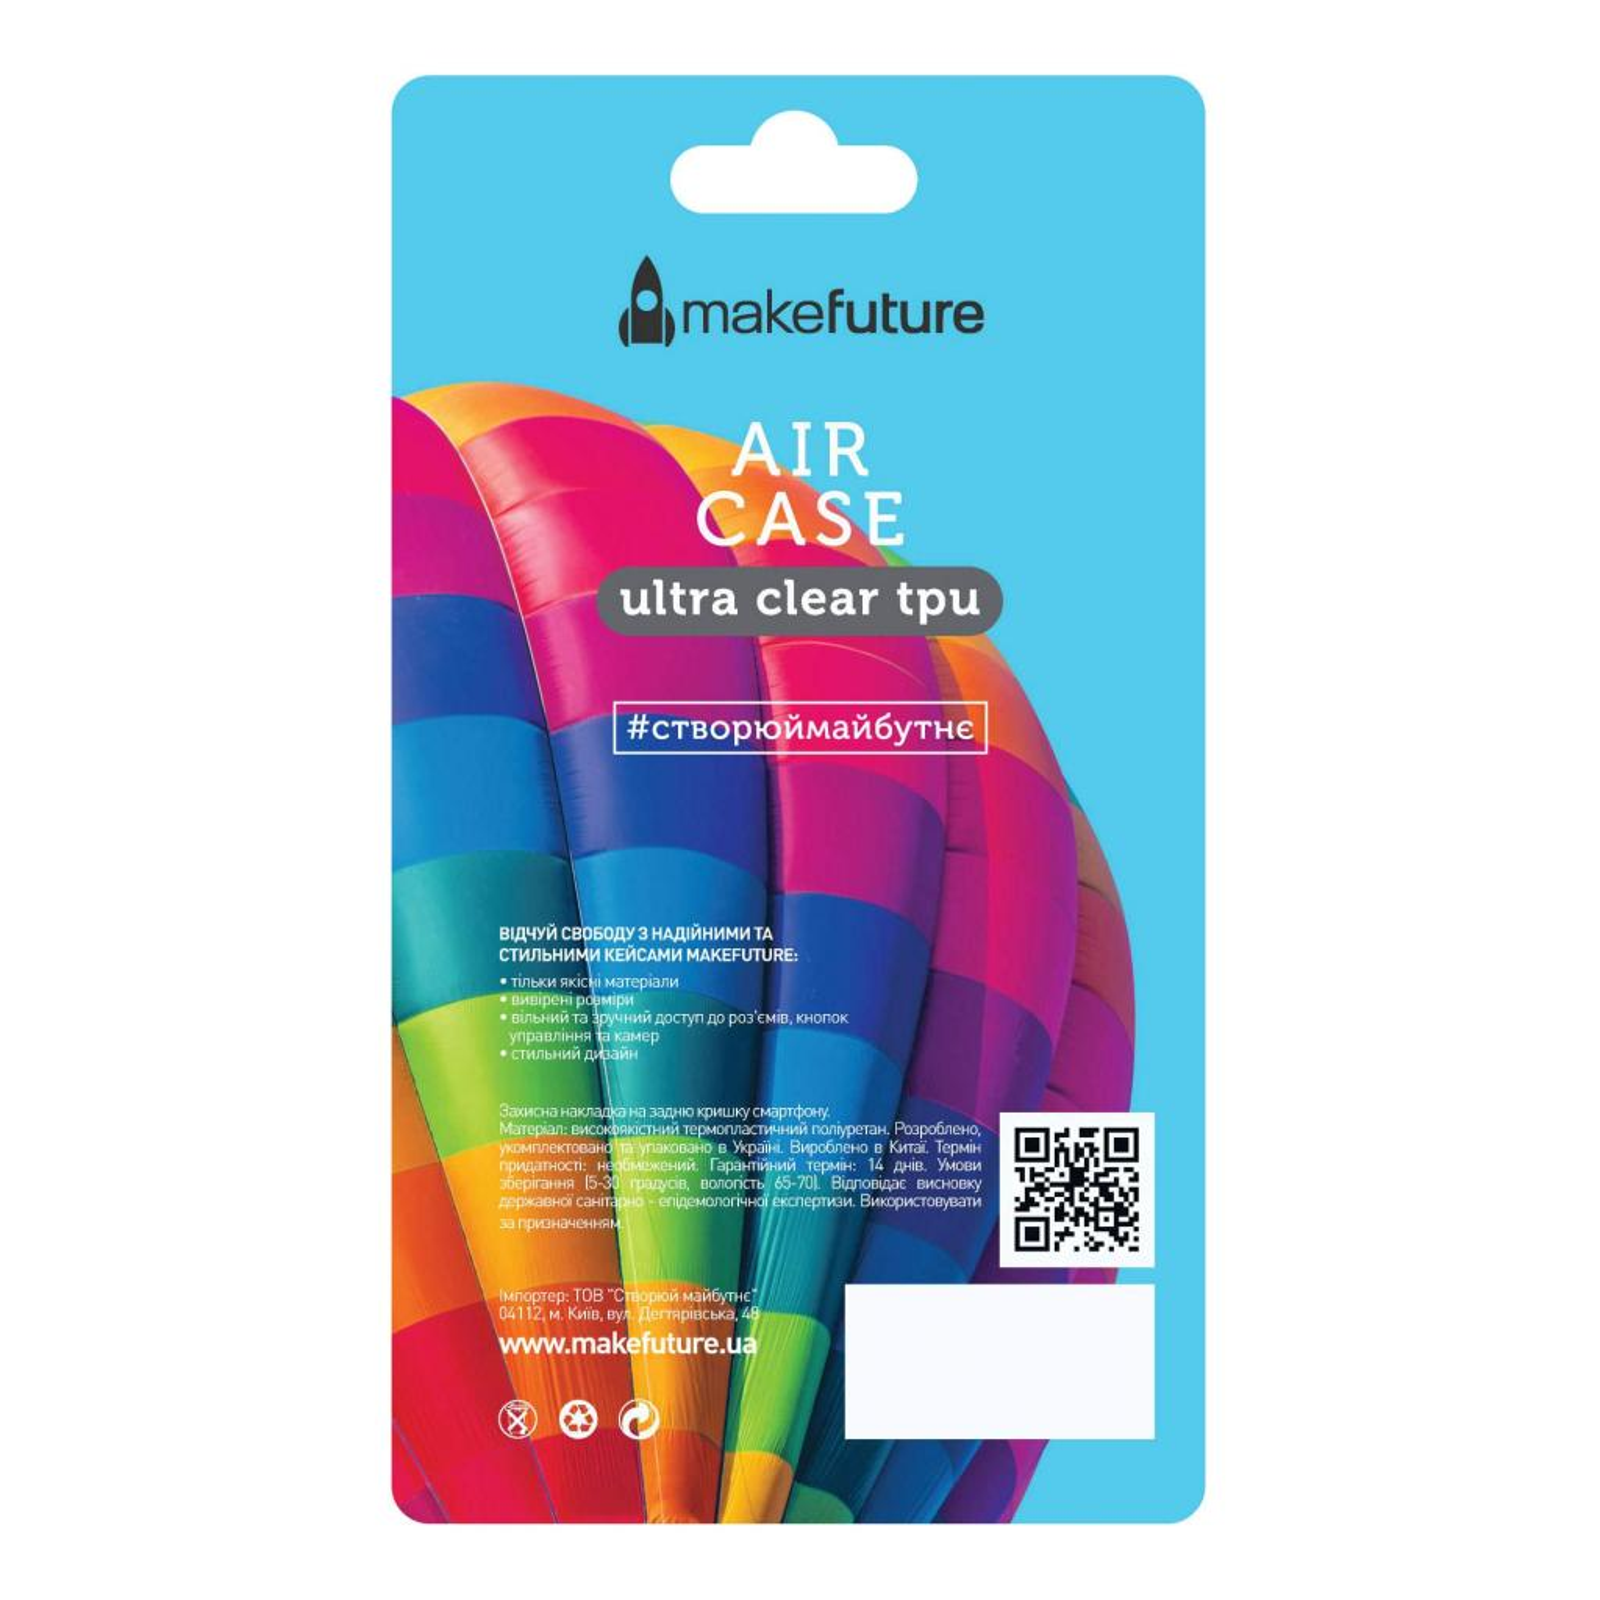 Чехол для моб. телефона MakeFuture Air Case (TPU) для Apple iPhone 8 Plus (MCA-AI8P) изображение 2